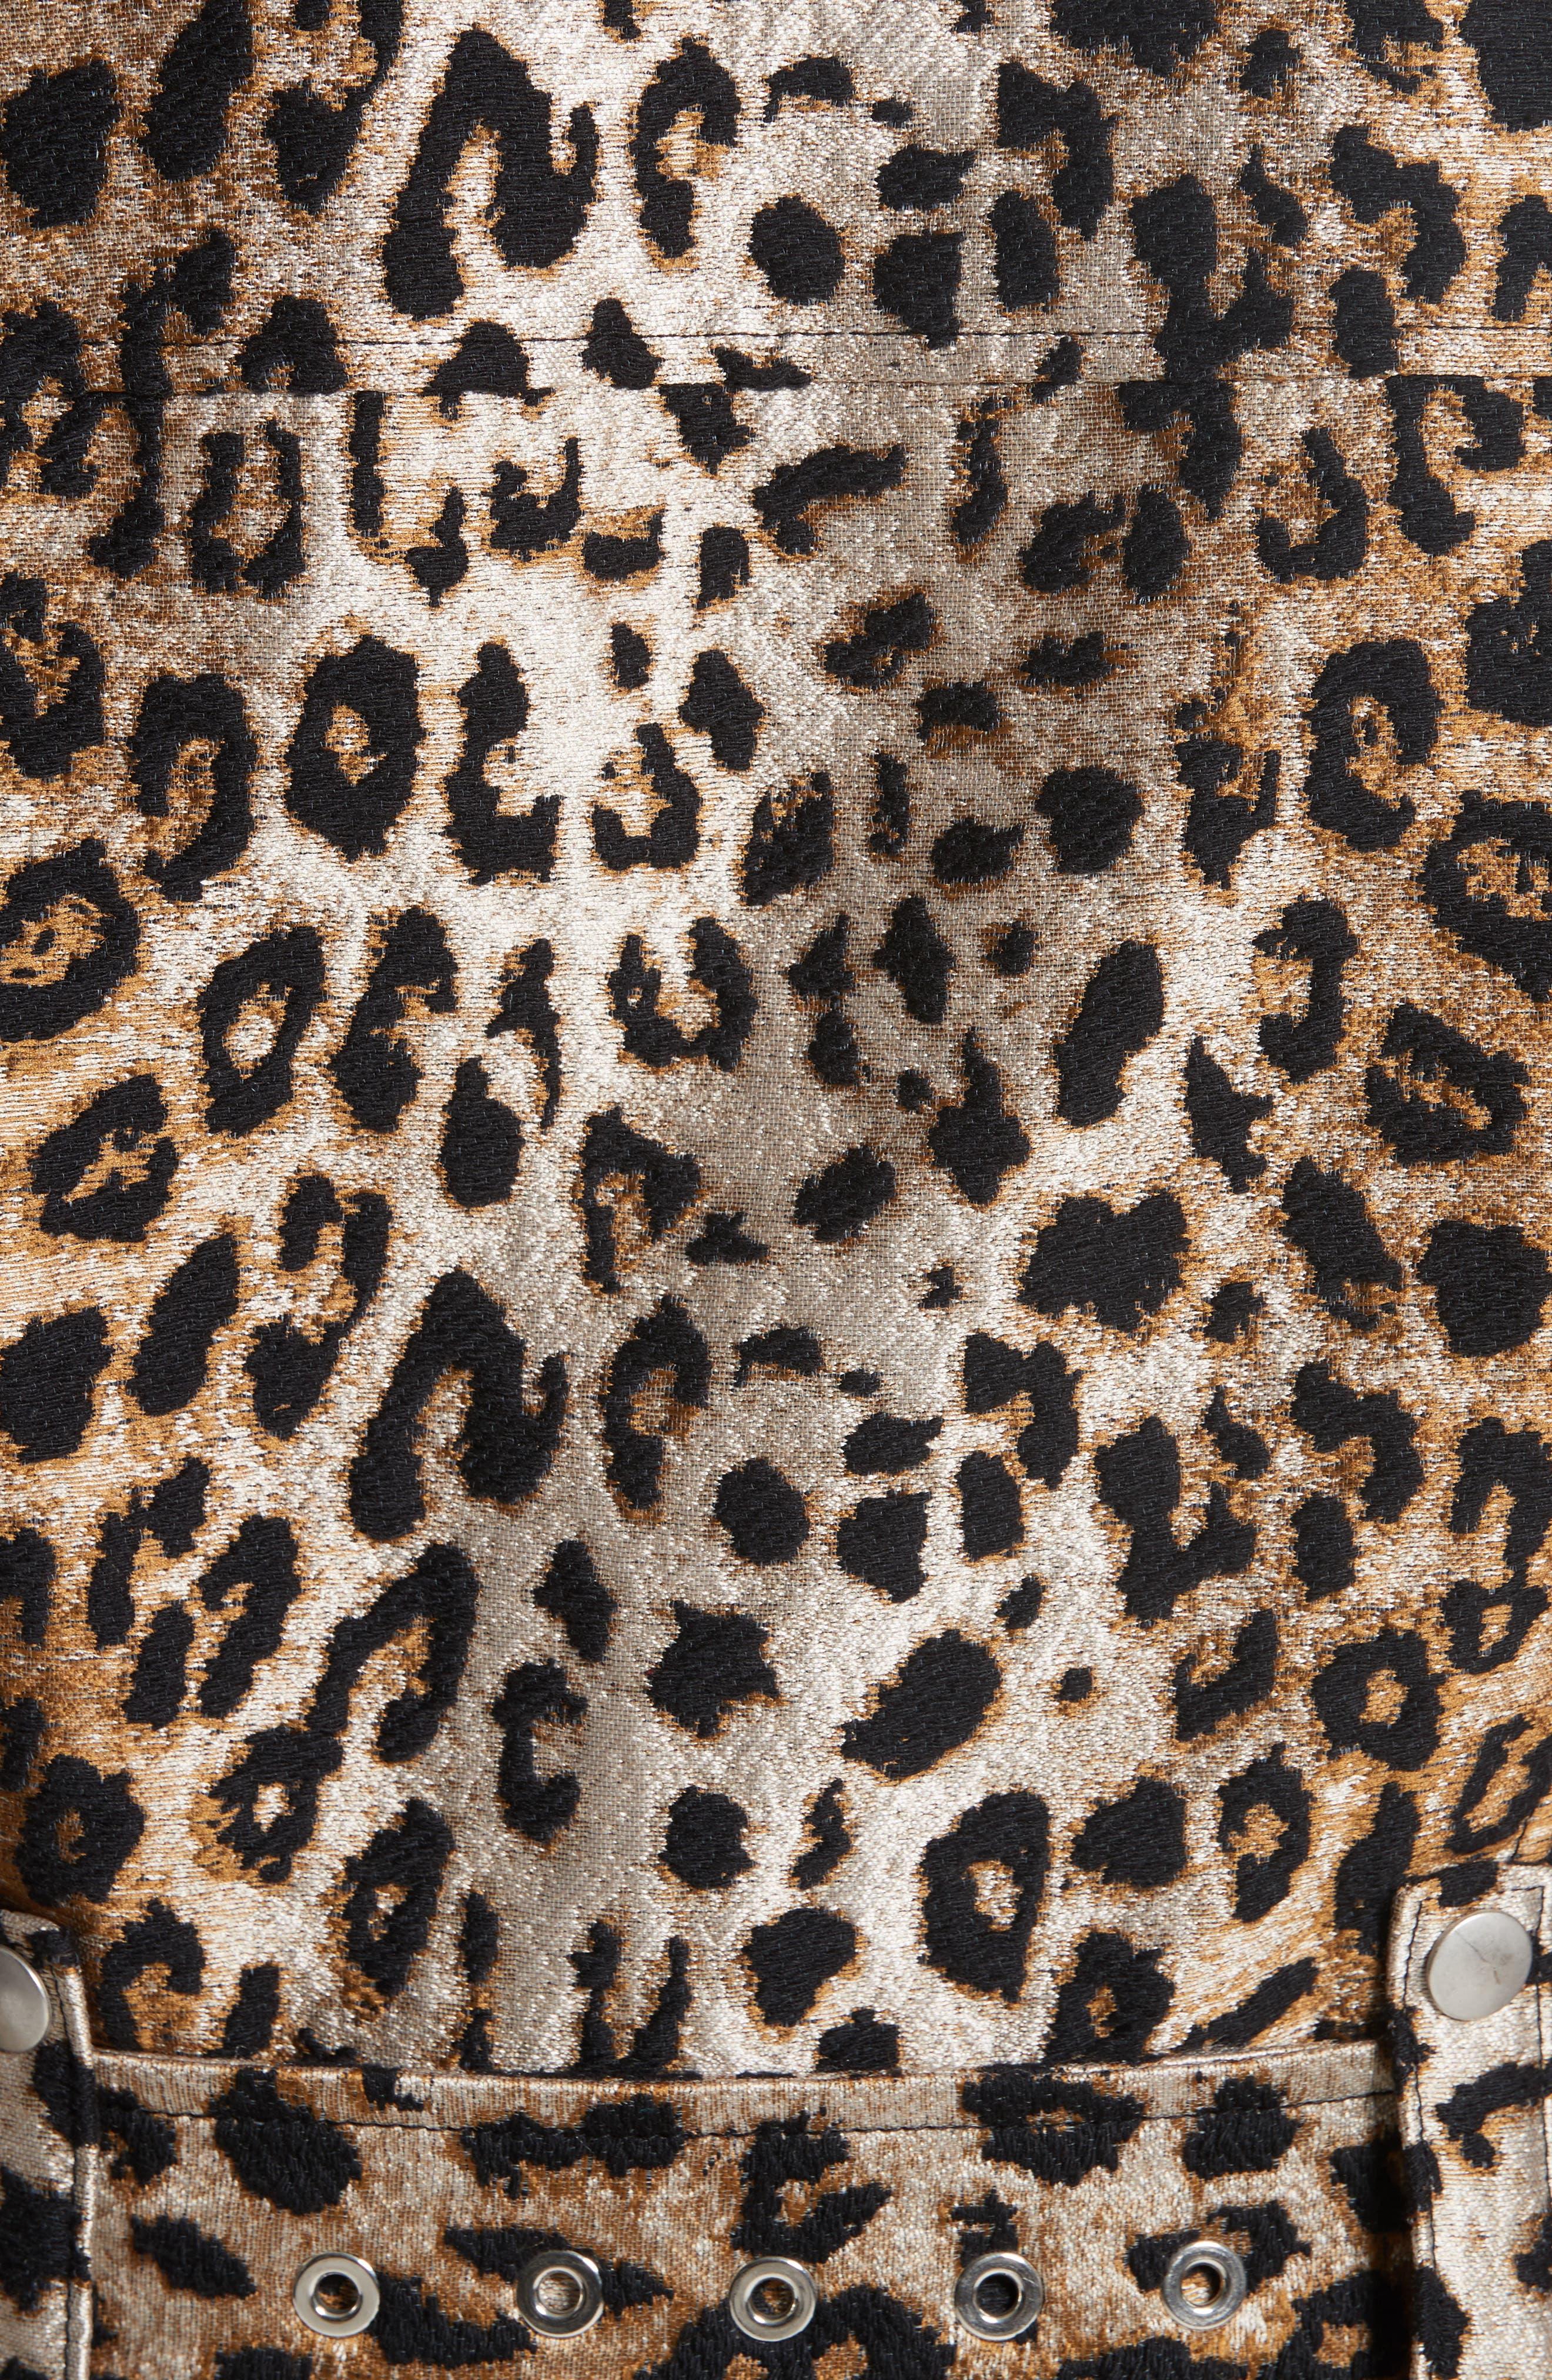 Leopard Jacquard Trench Coat,                             Alternate thumbnail 6, color,                             200